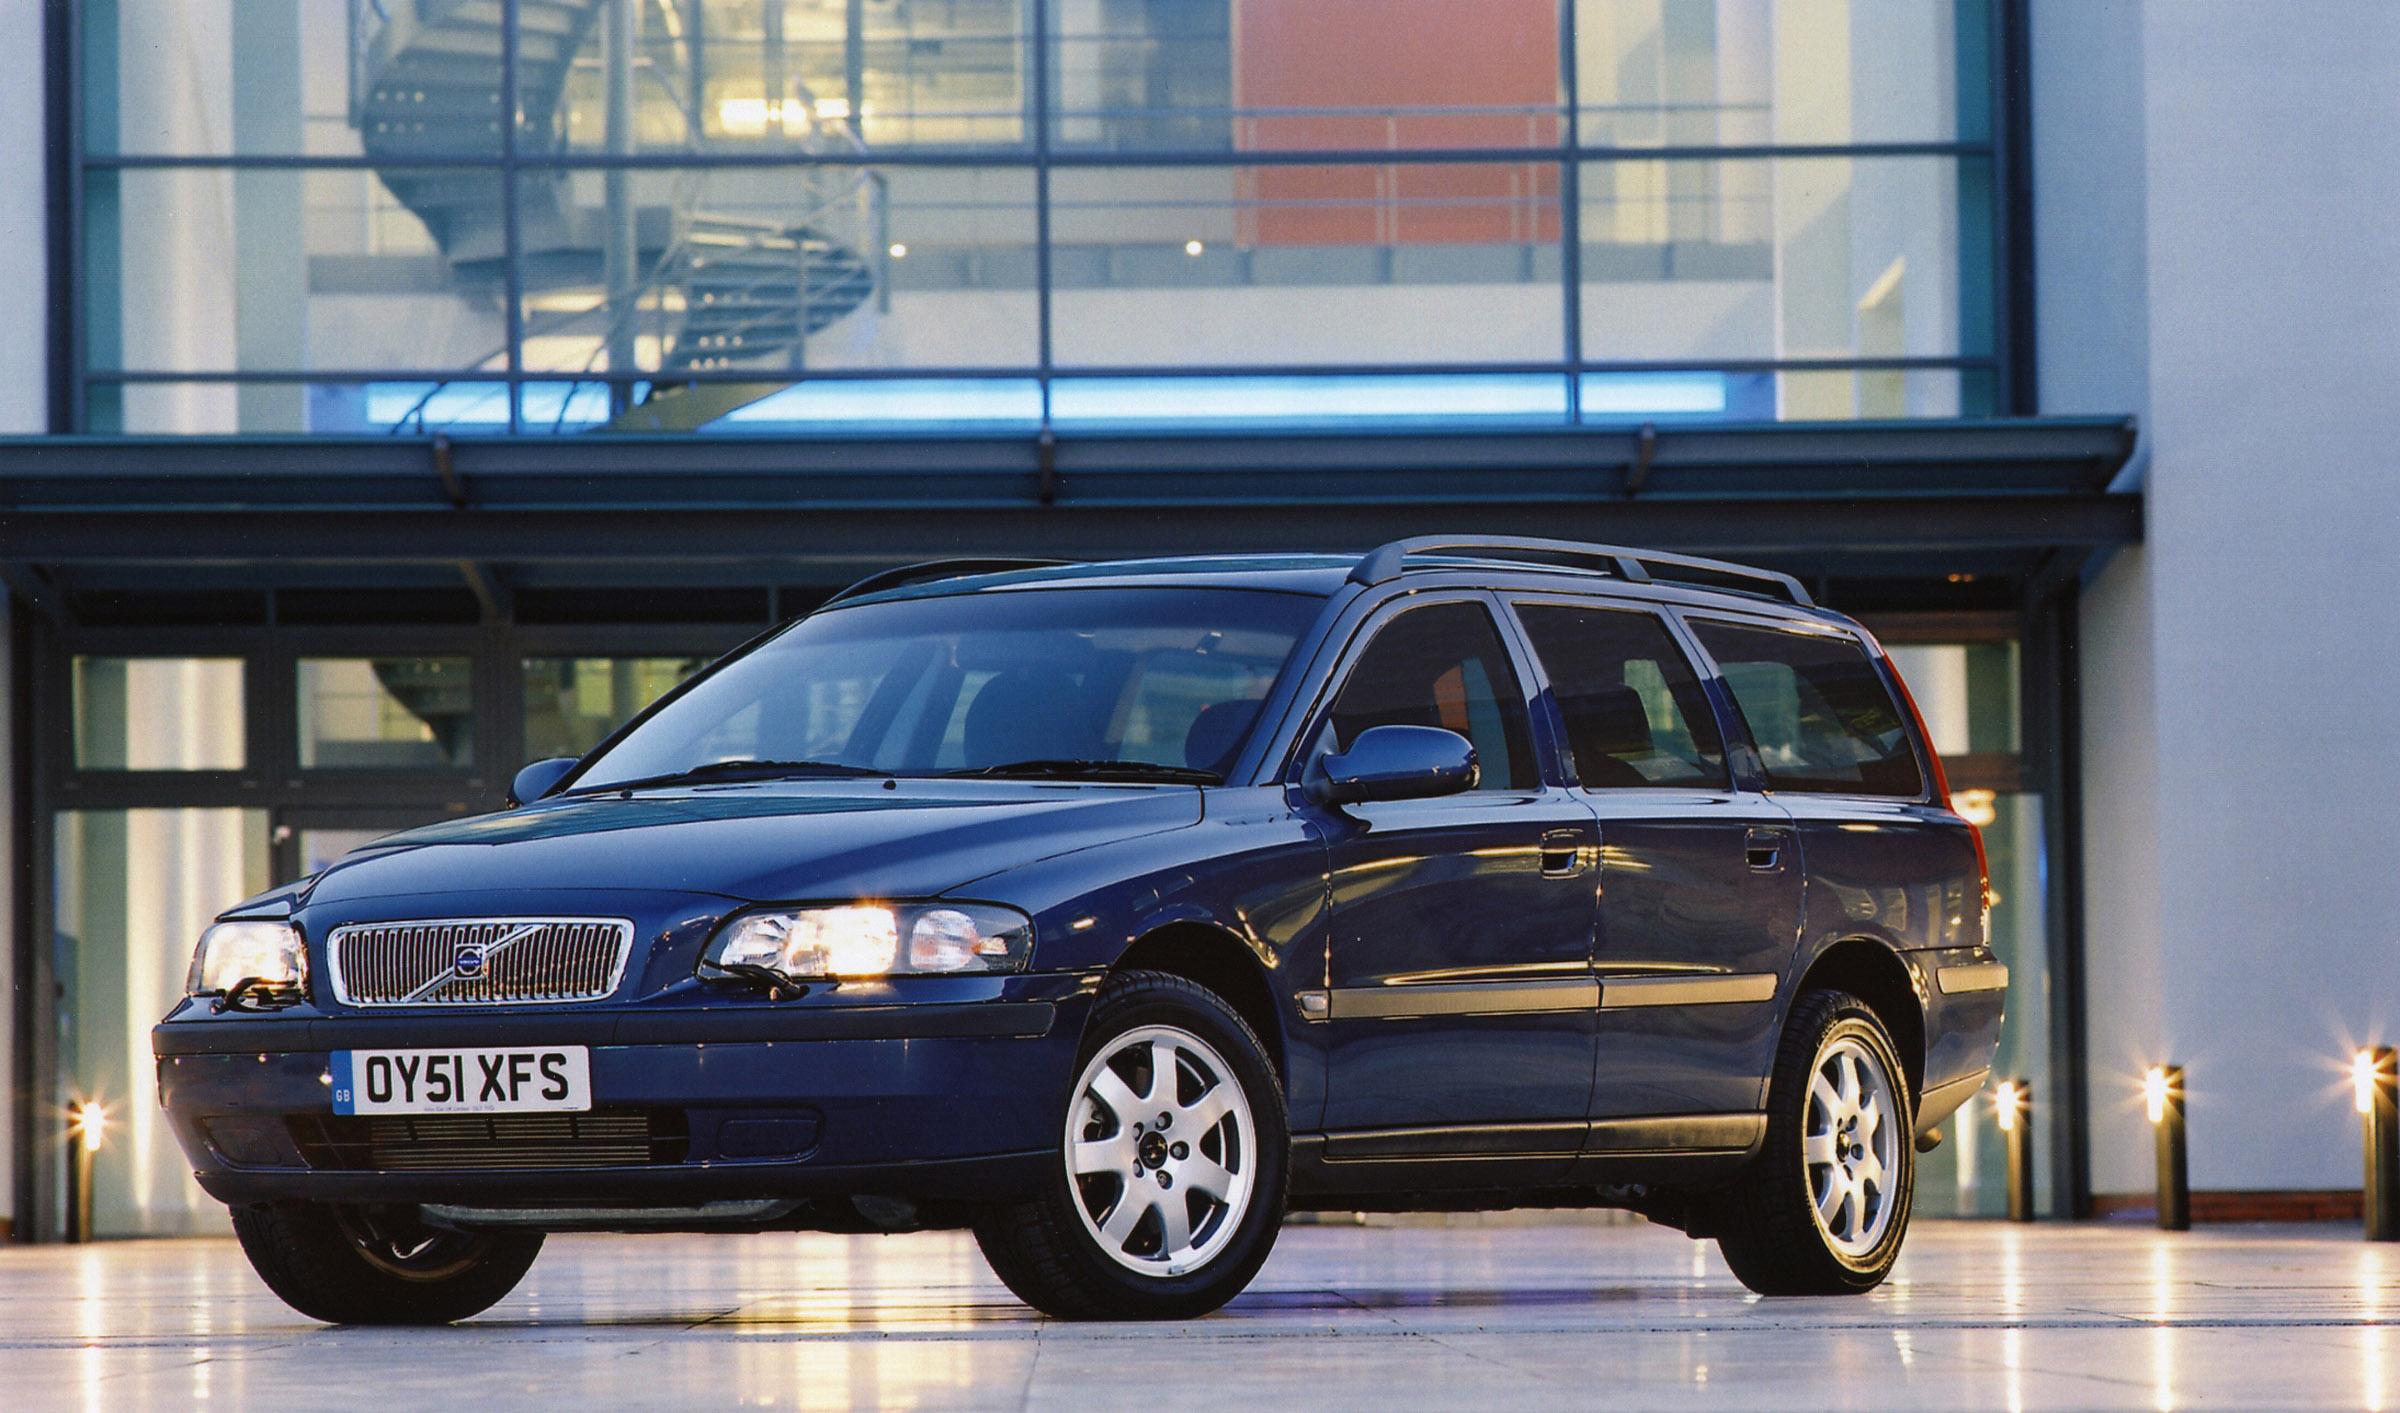 Volvo V70 2001 - Picture 14179